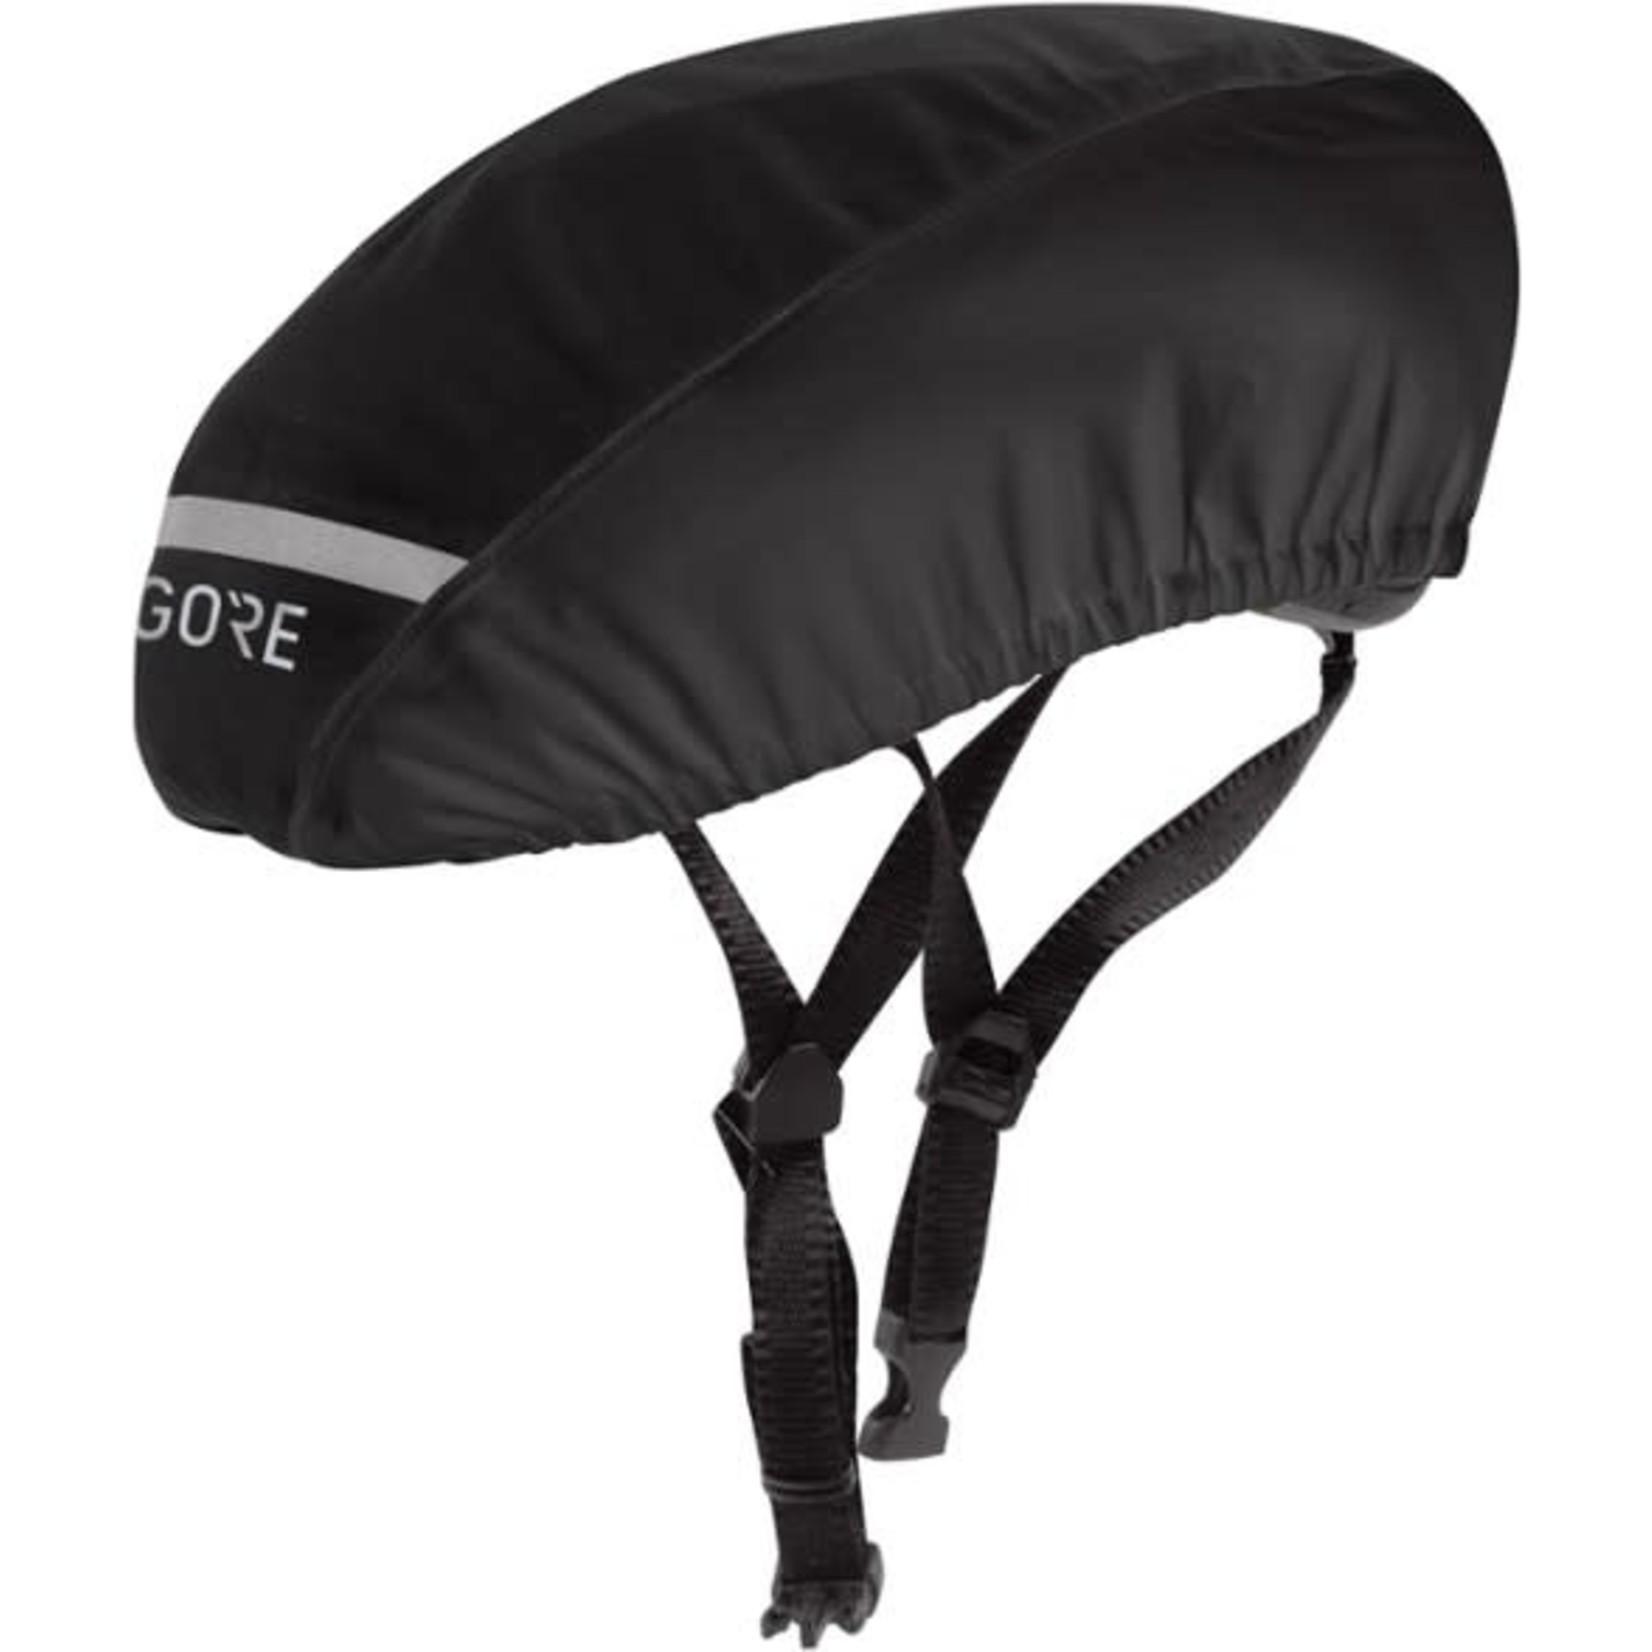 GORE Wear GORE C3 GORE-TEX Helmet Cover, BLK MD